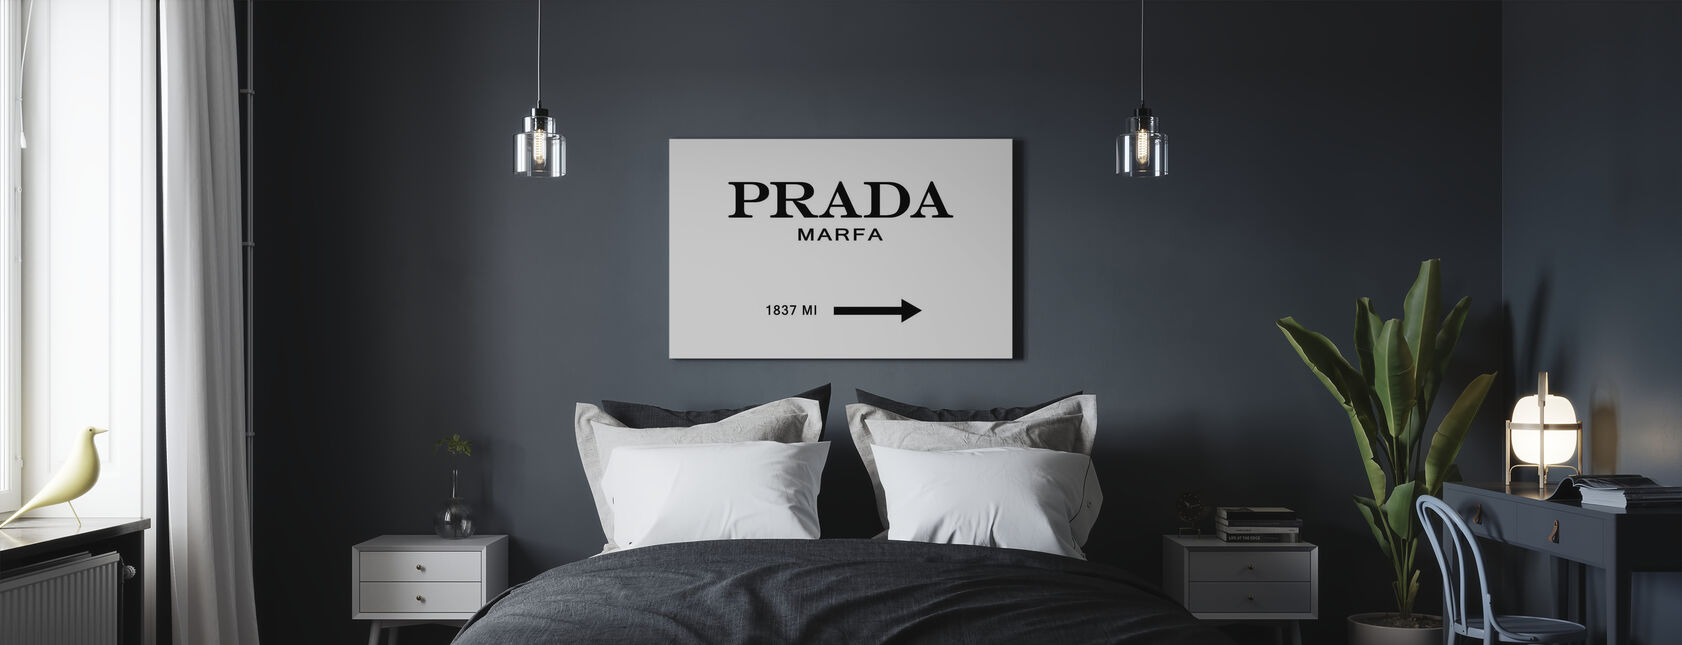 Prada Marfa - Canvas print - Bedroom